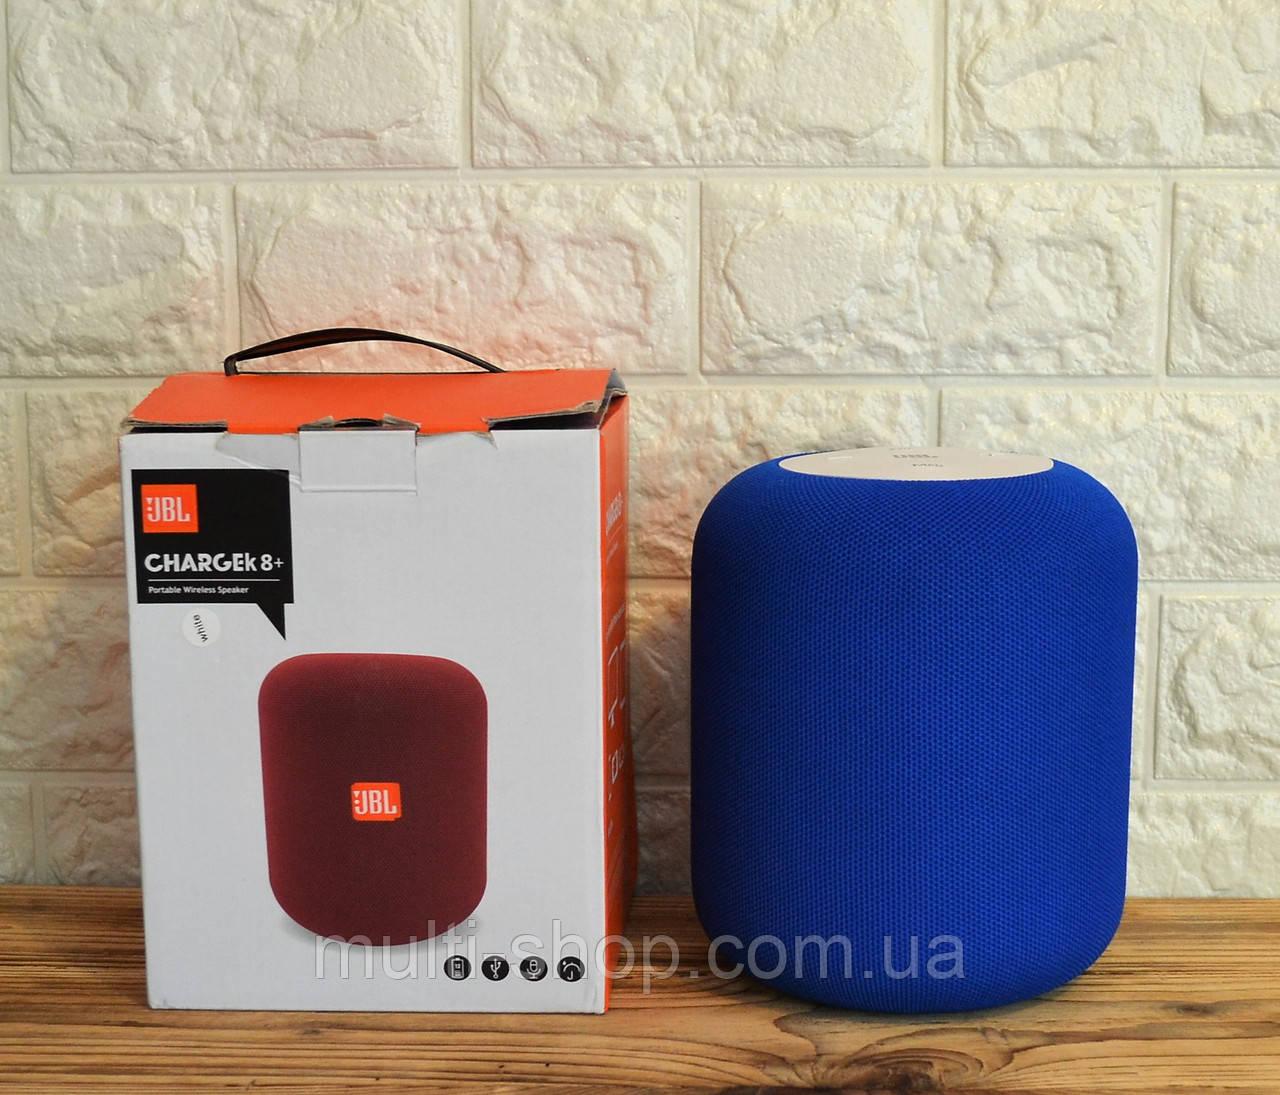 Портативная колонка Bluetooth Charge k8+ реплика